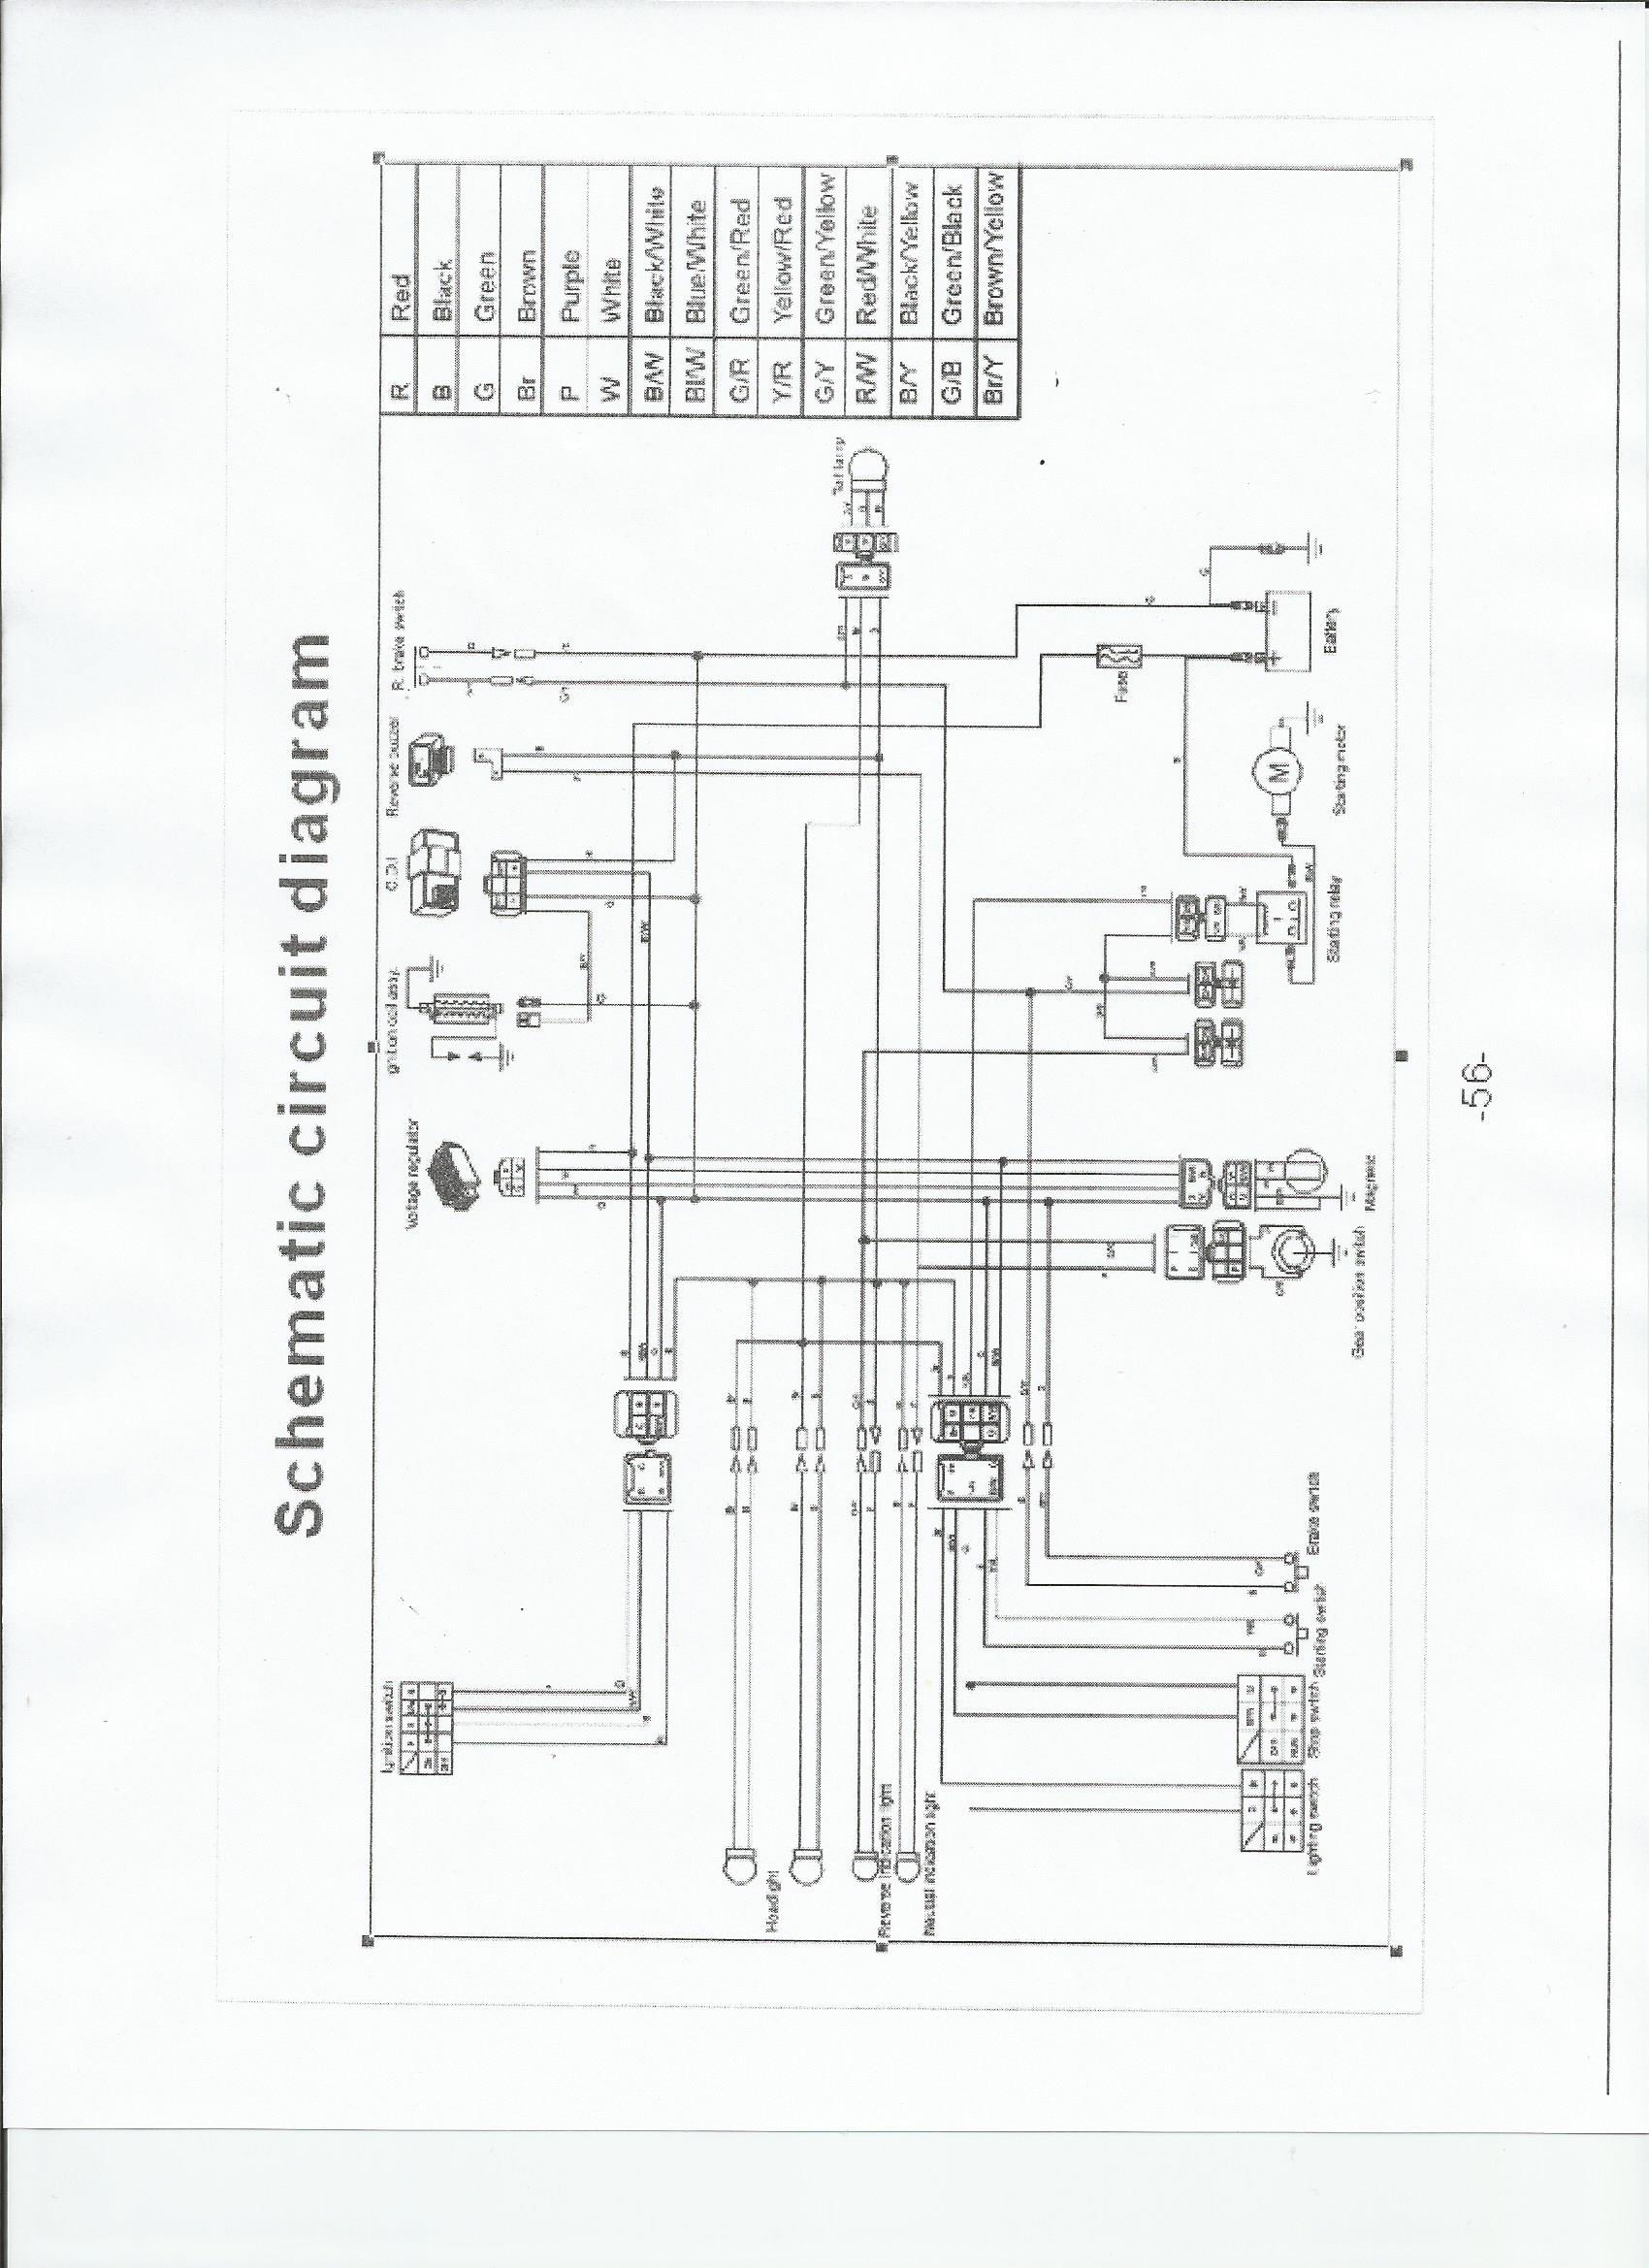 lifan 7000 wiring diagram